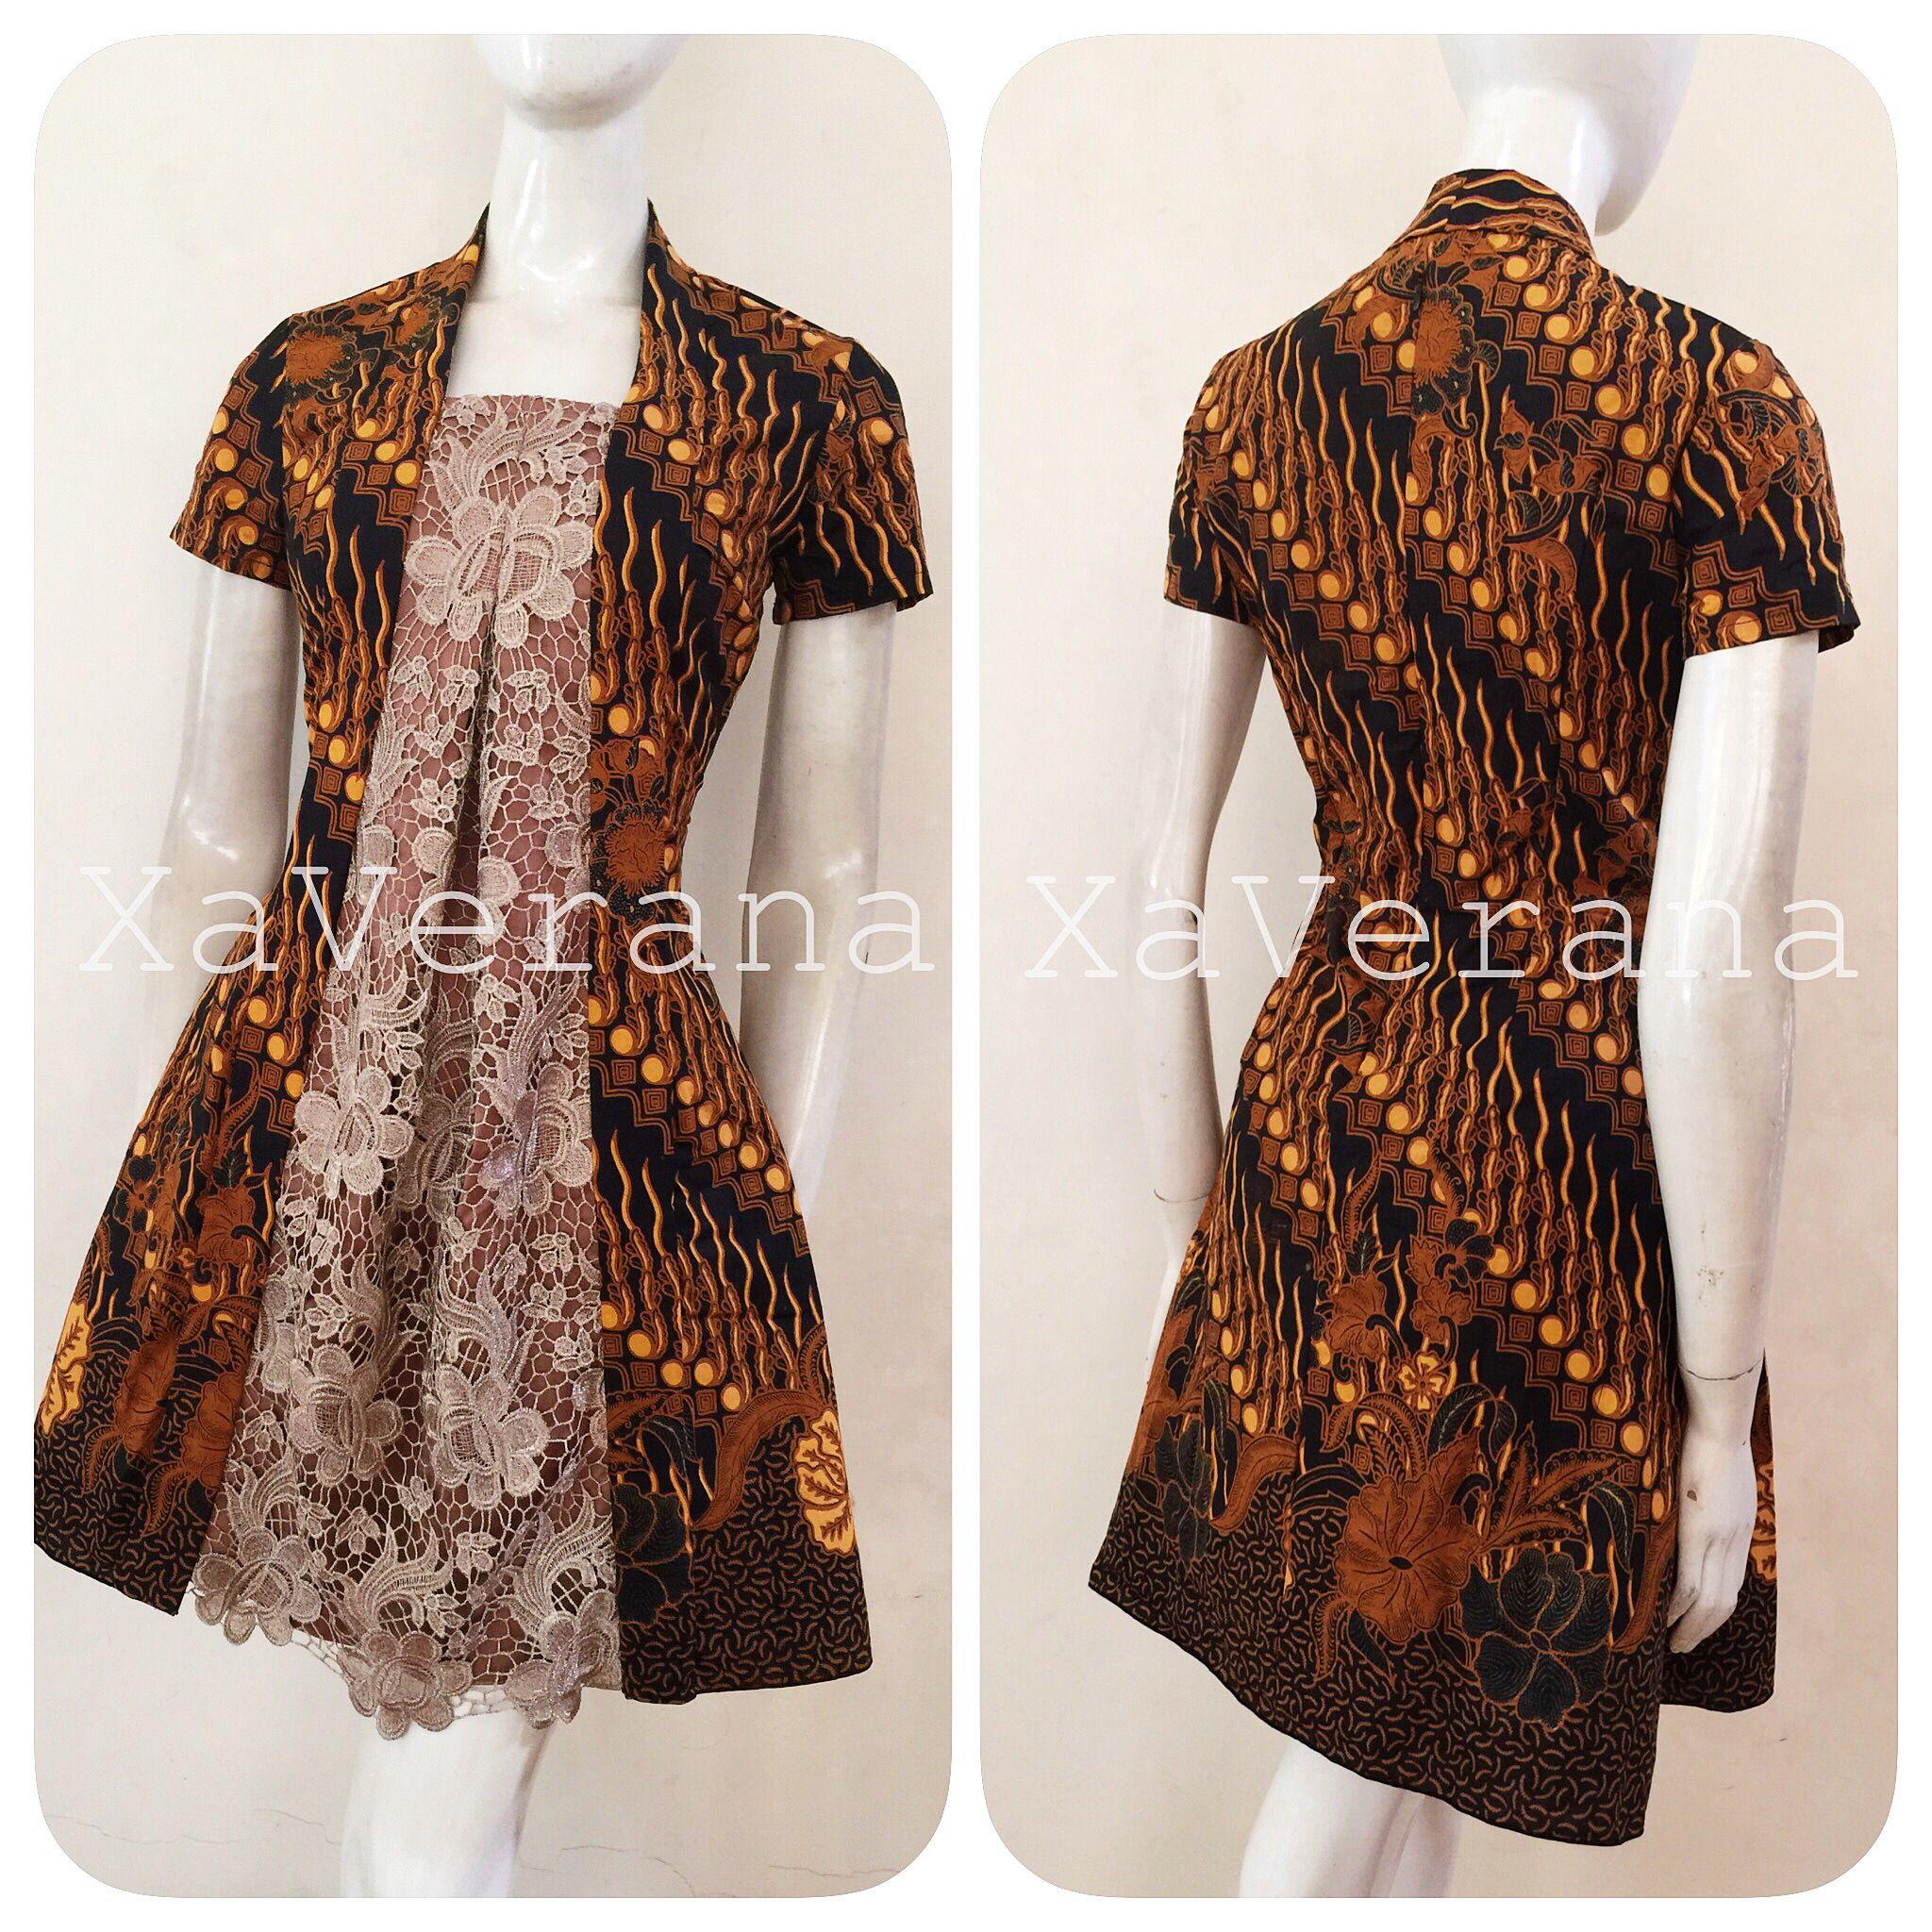 Kebaya kutubaru dress Instagram xaverana  batik  Pinterest